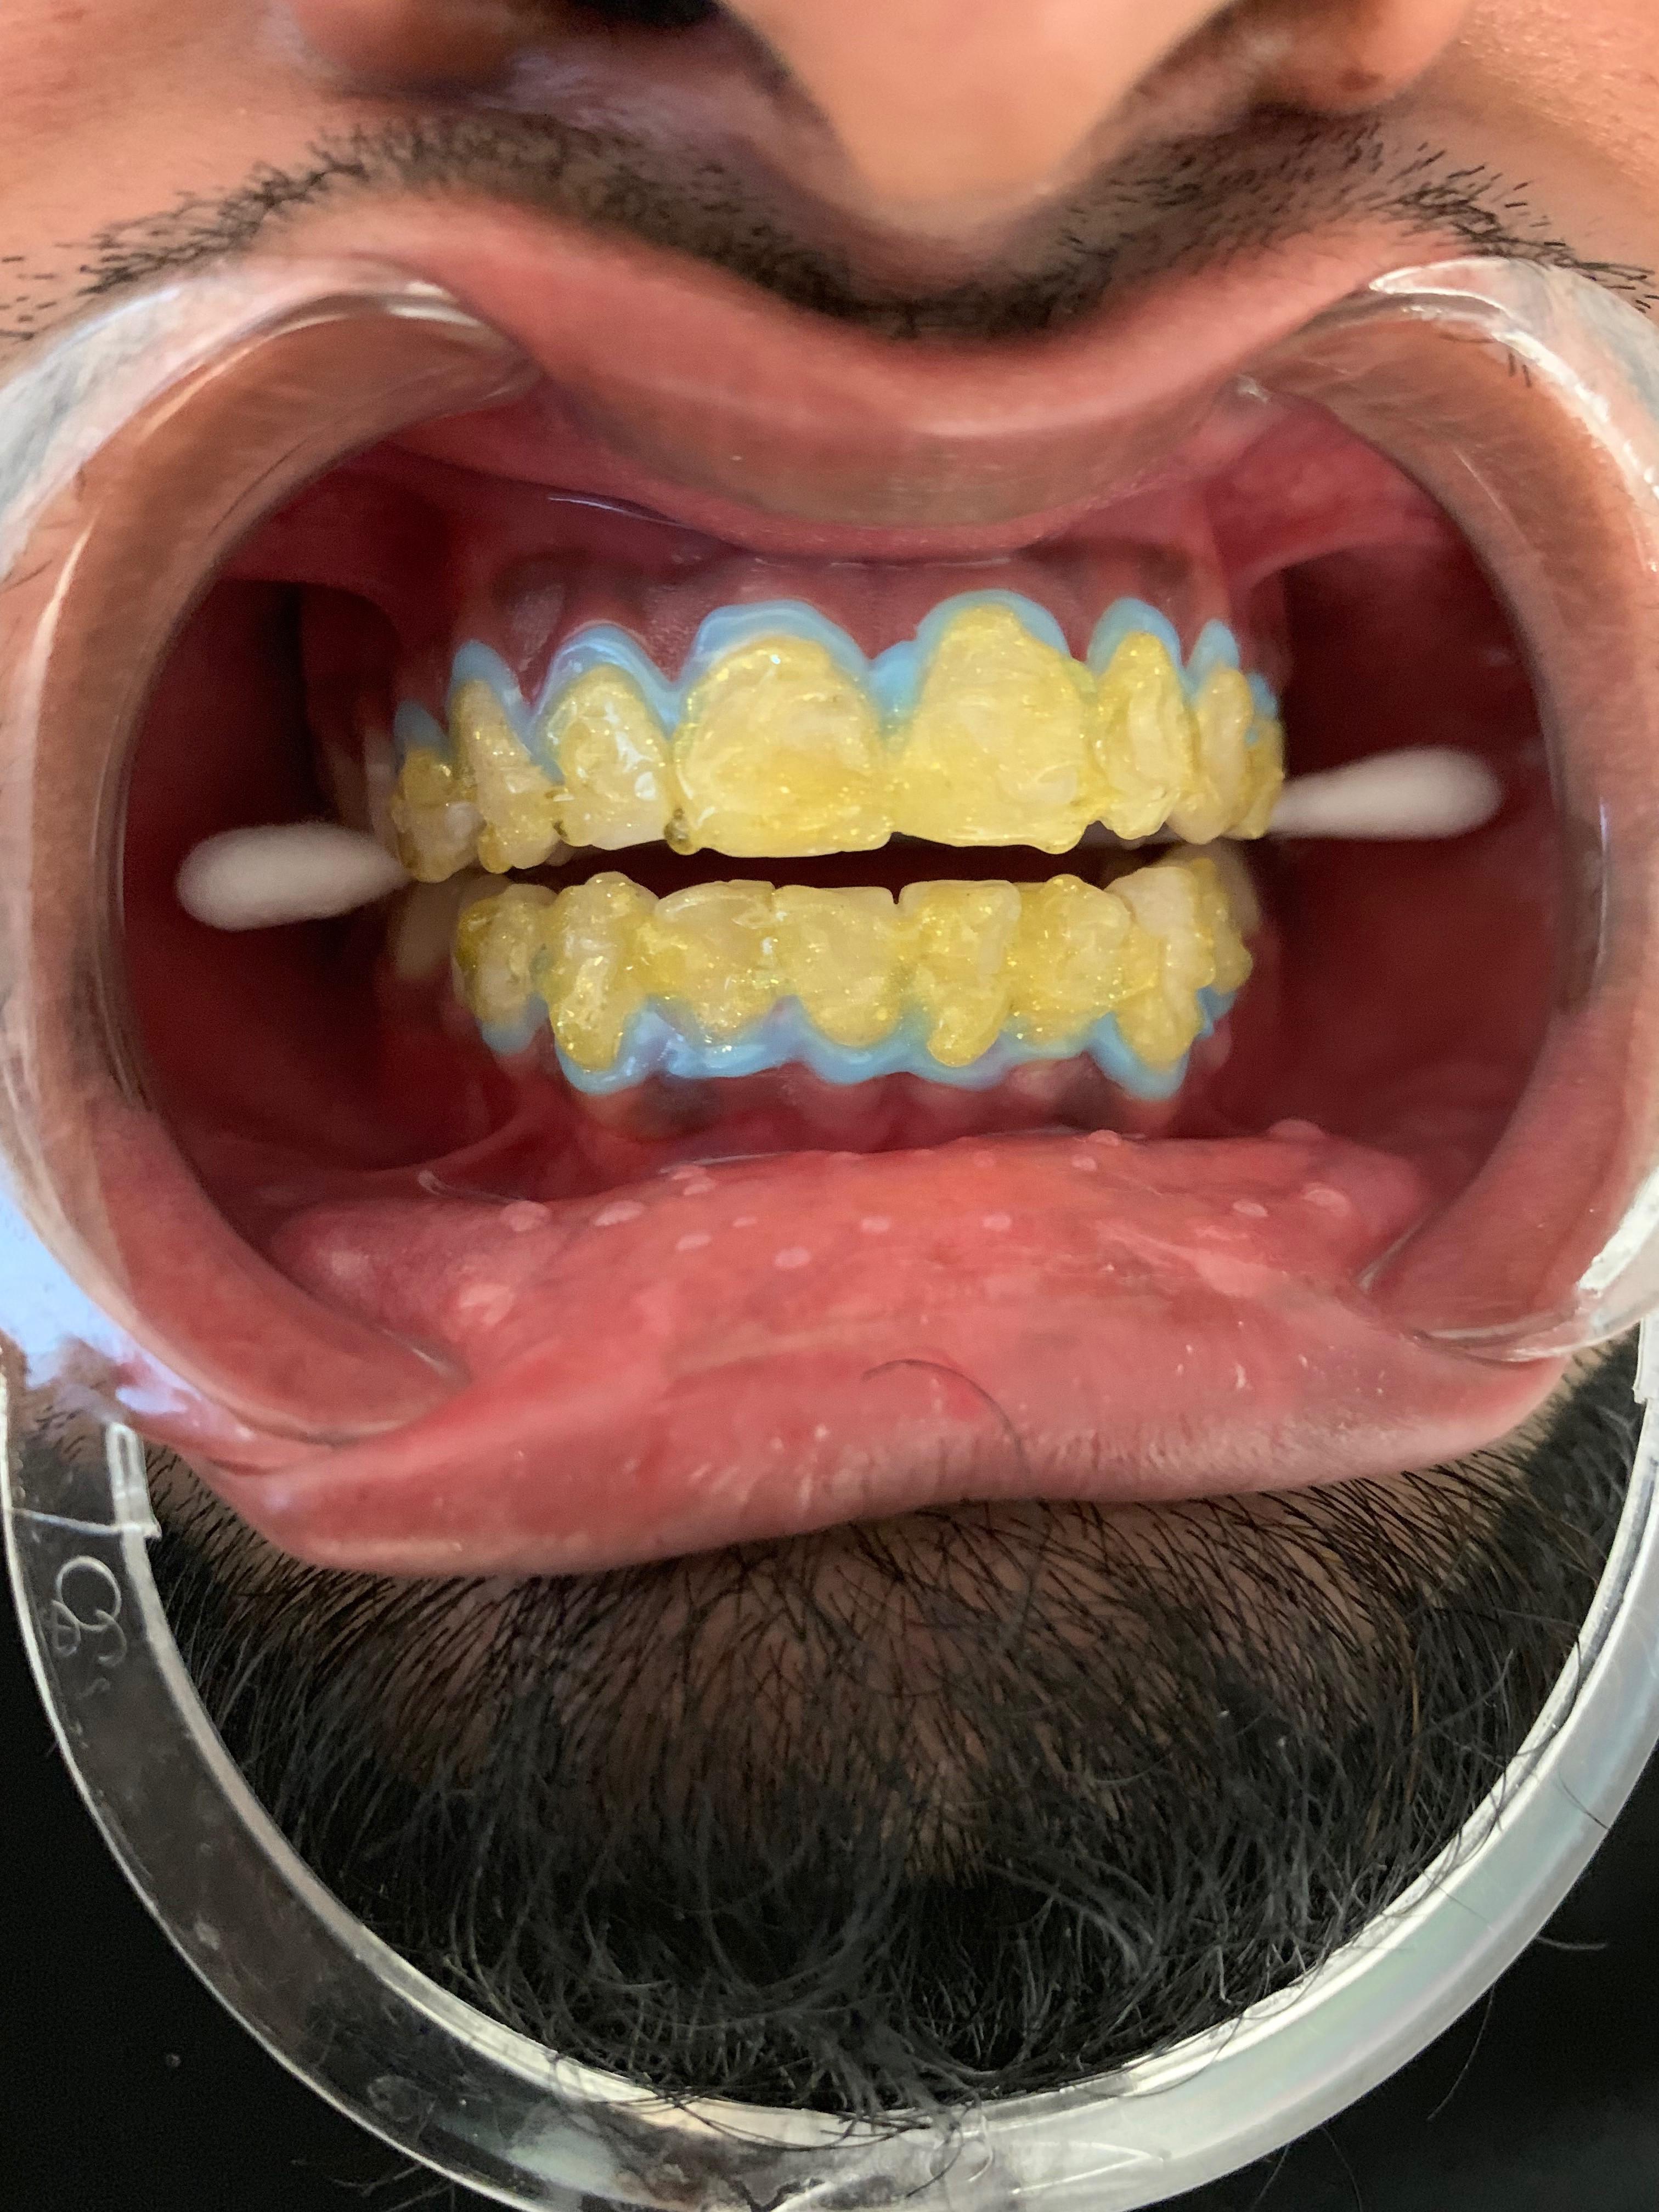 Teeth Whitening Gold Treatment